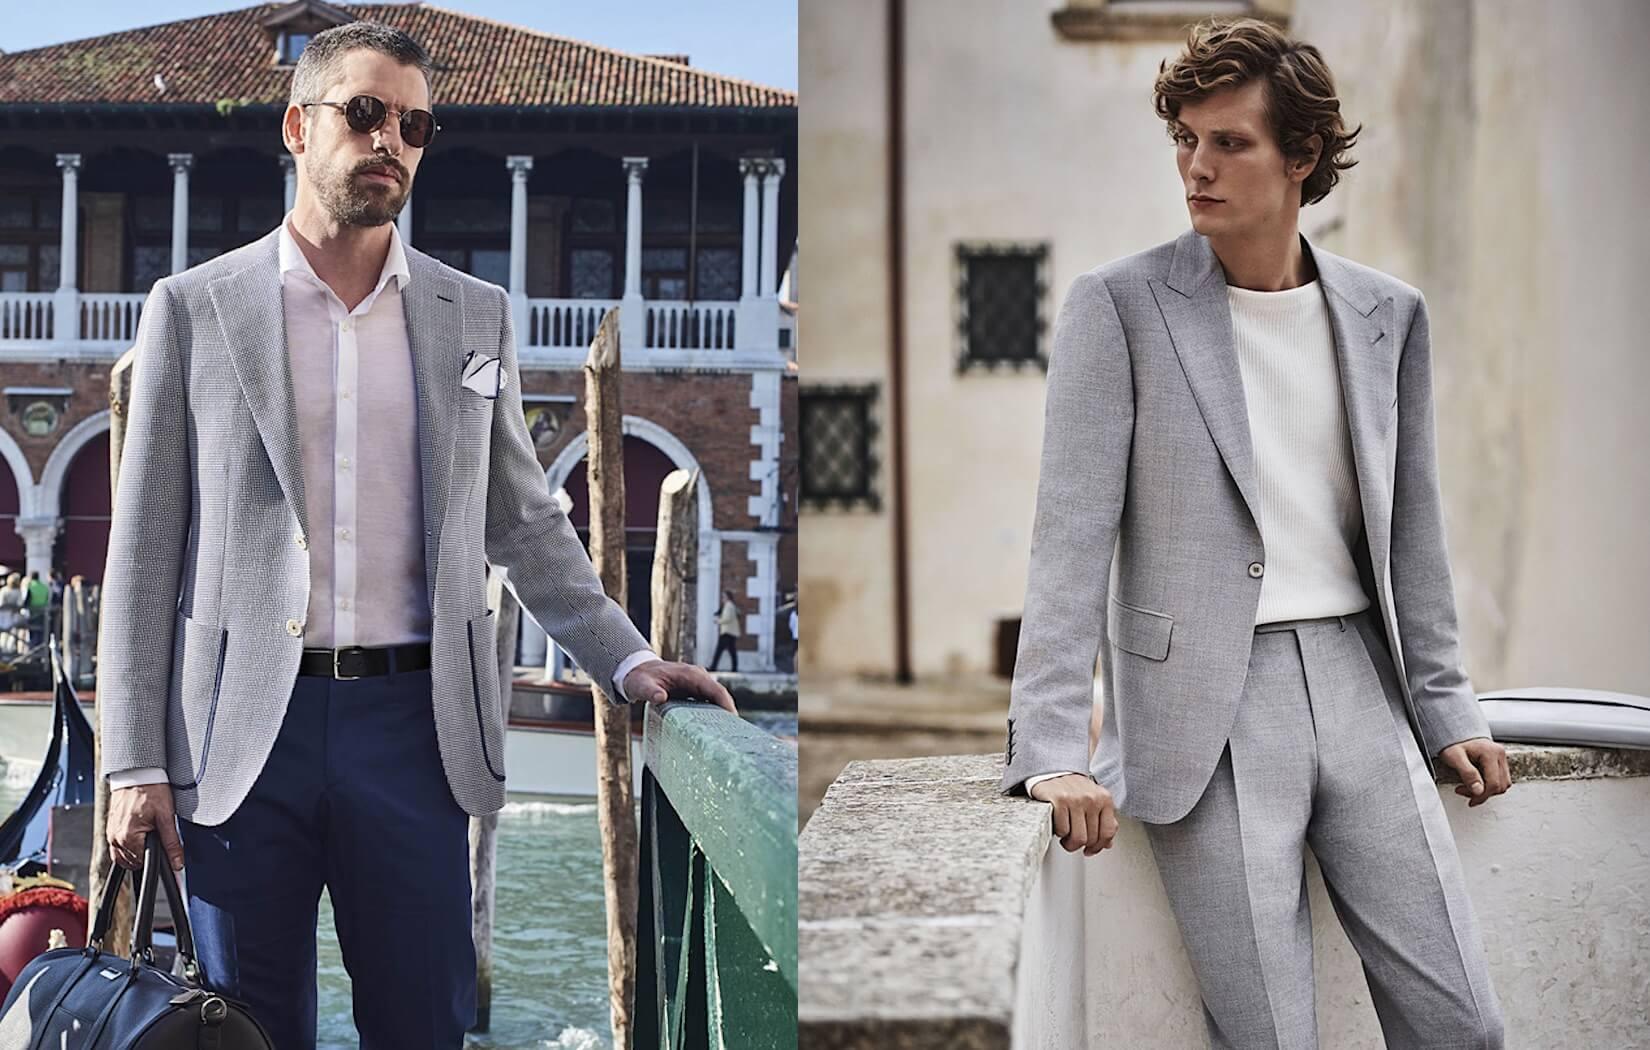 Outfit Matrimonio Uomo Casual : Home moda uomo donna